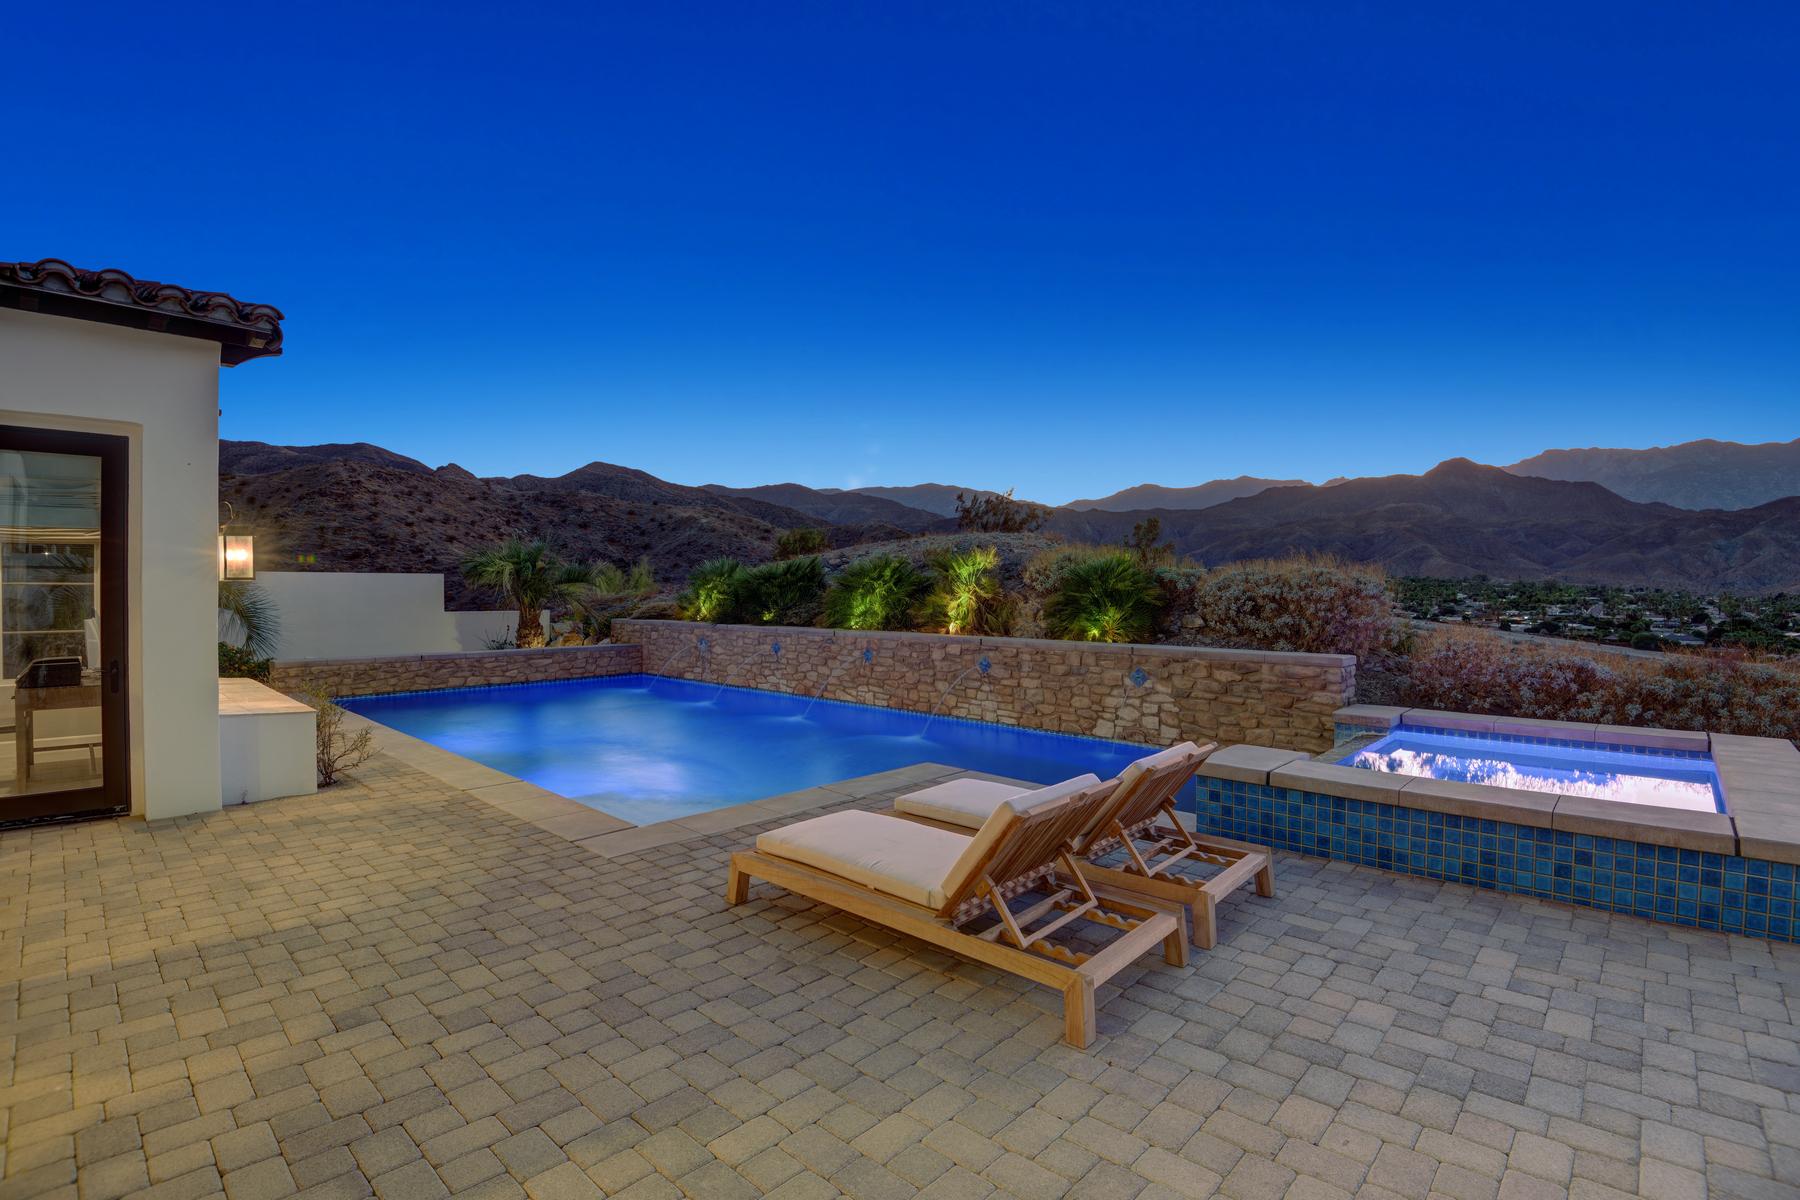 Single Family Homes for Sale at 22 Mount San Jacinto Circle Rancho Mirage, California 92270 United States